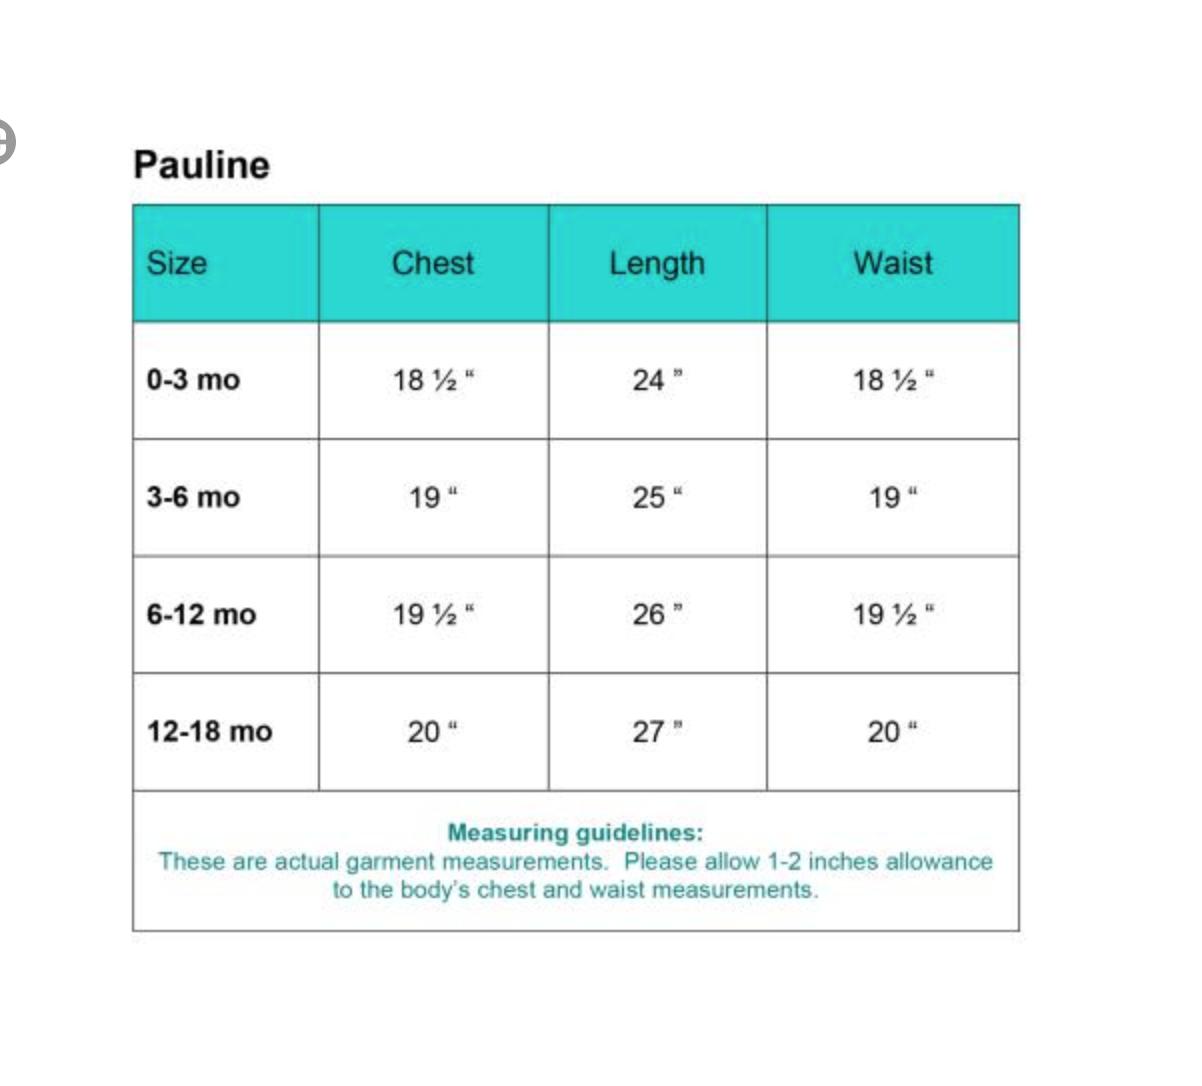 sizing-chart-pauline.png